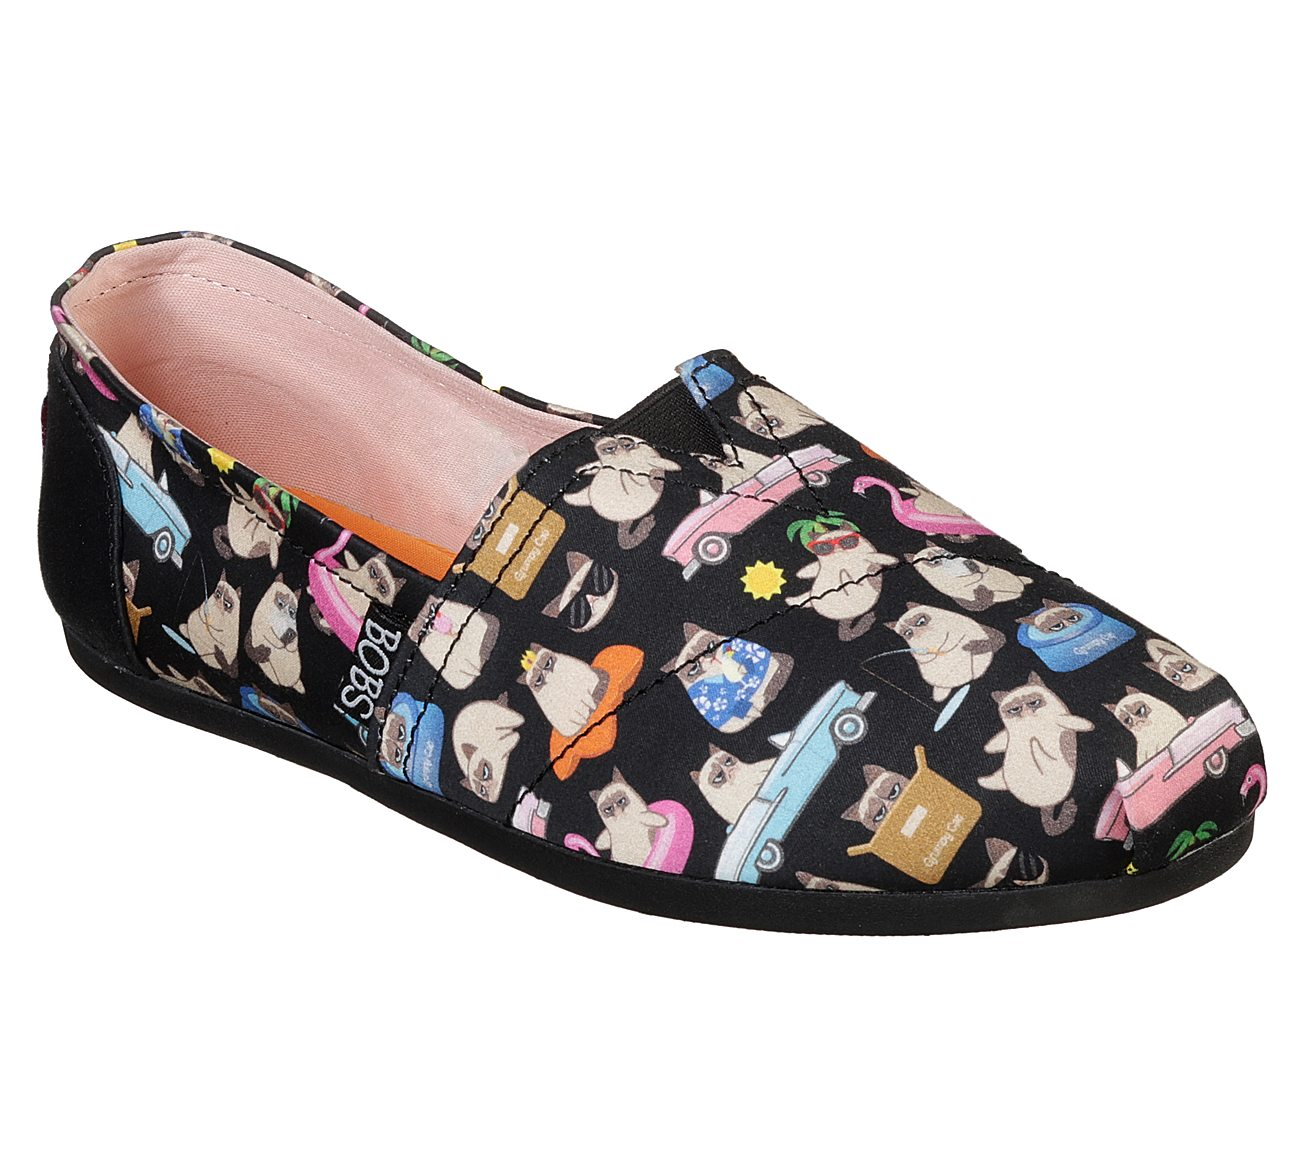 3c89de92aa860 Skechers Grumpy Cat x BOBS Plush - Grumpy Vacay Shoes | Grumpy Cat®